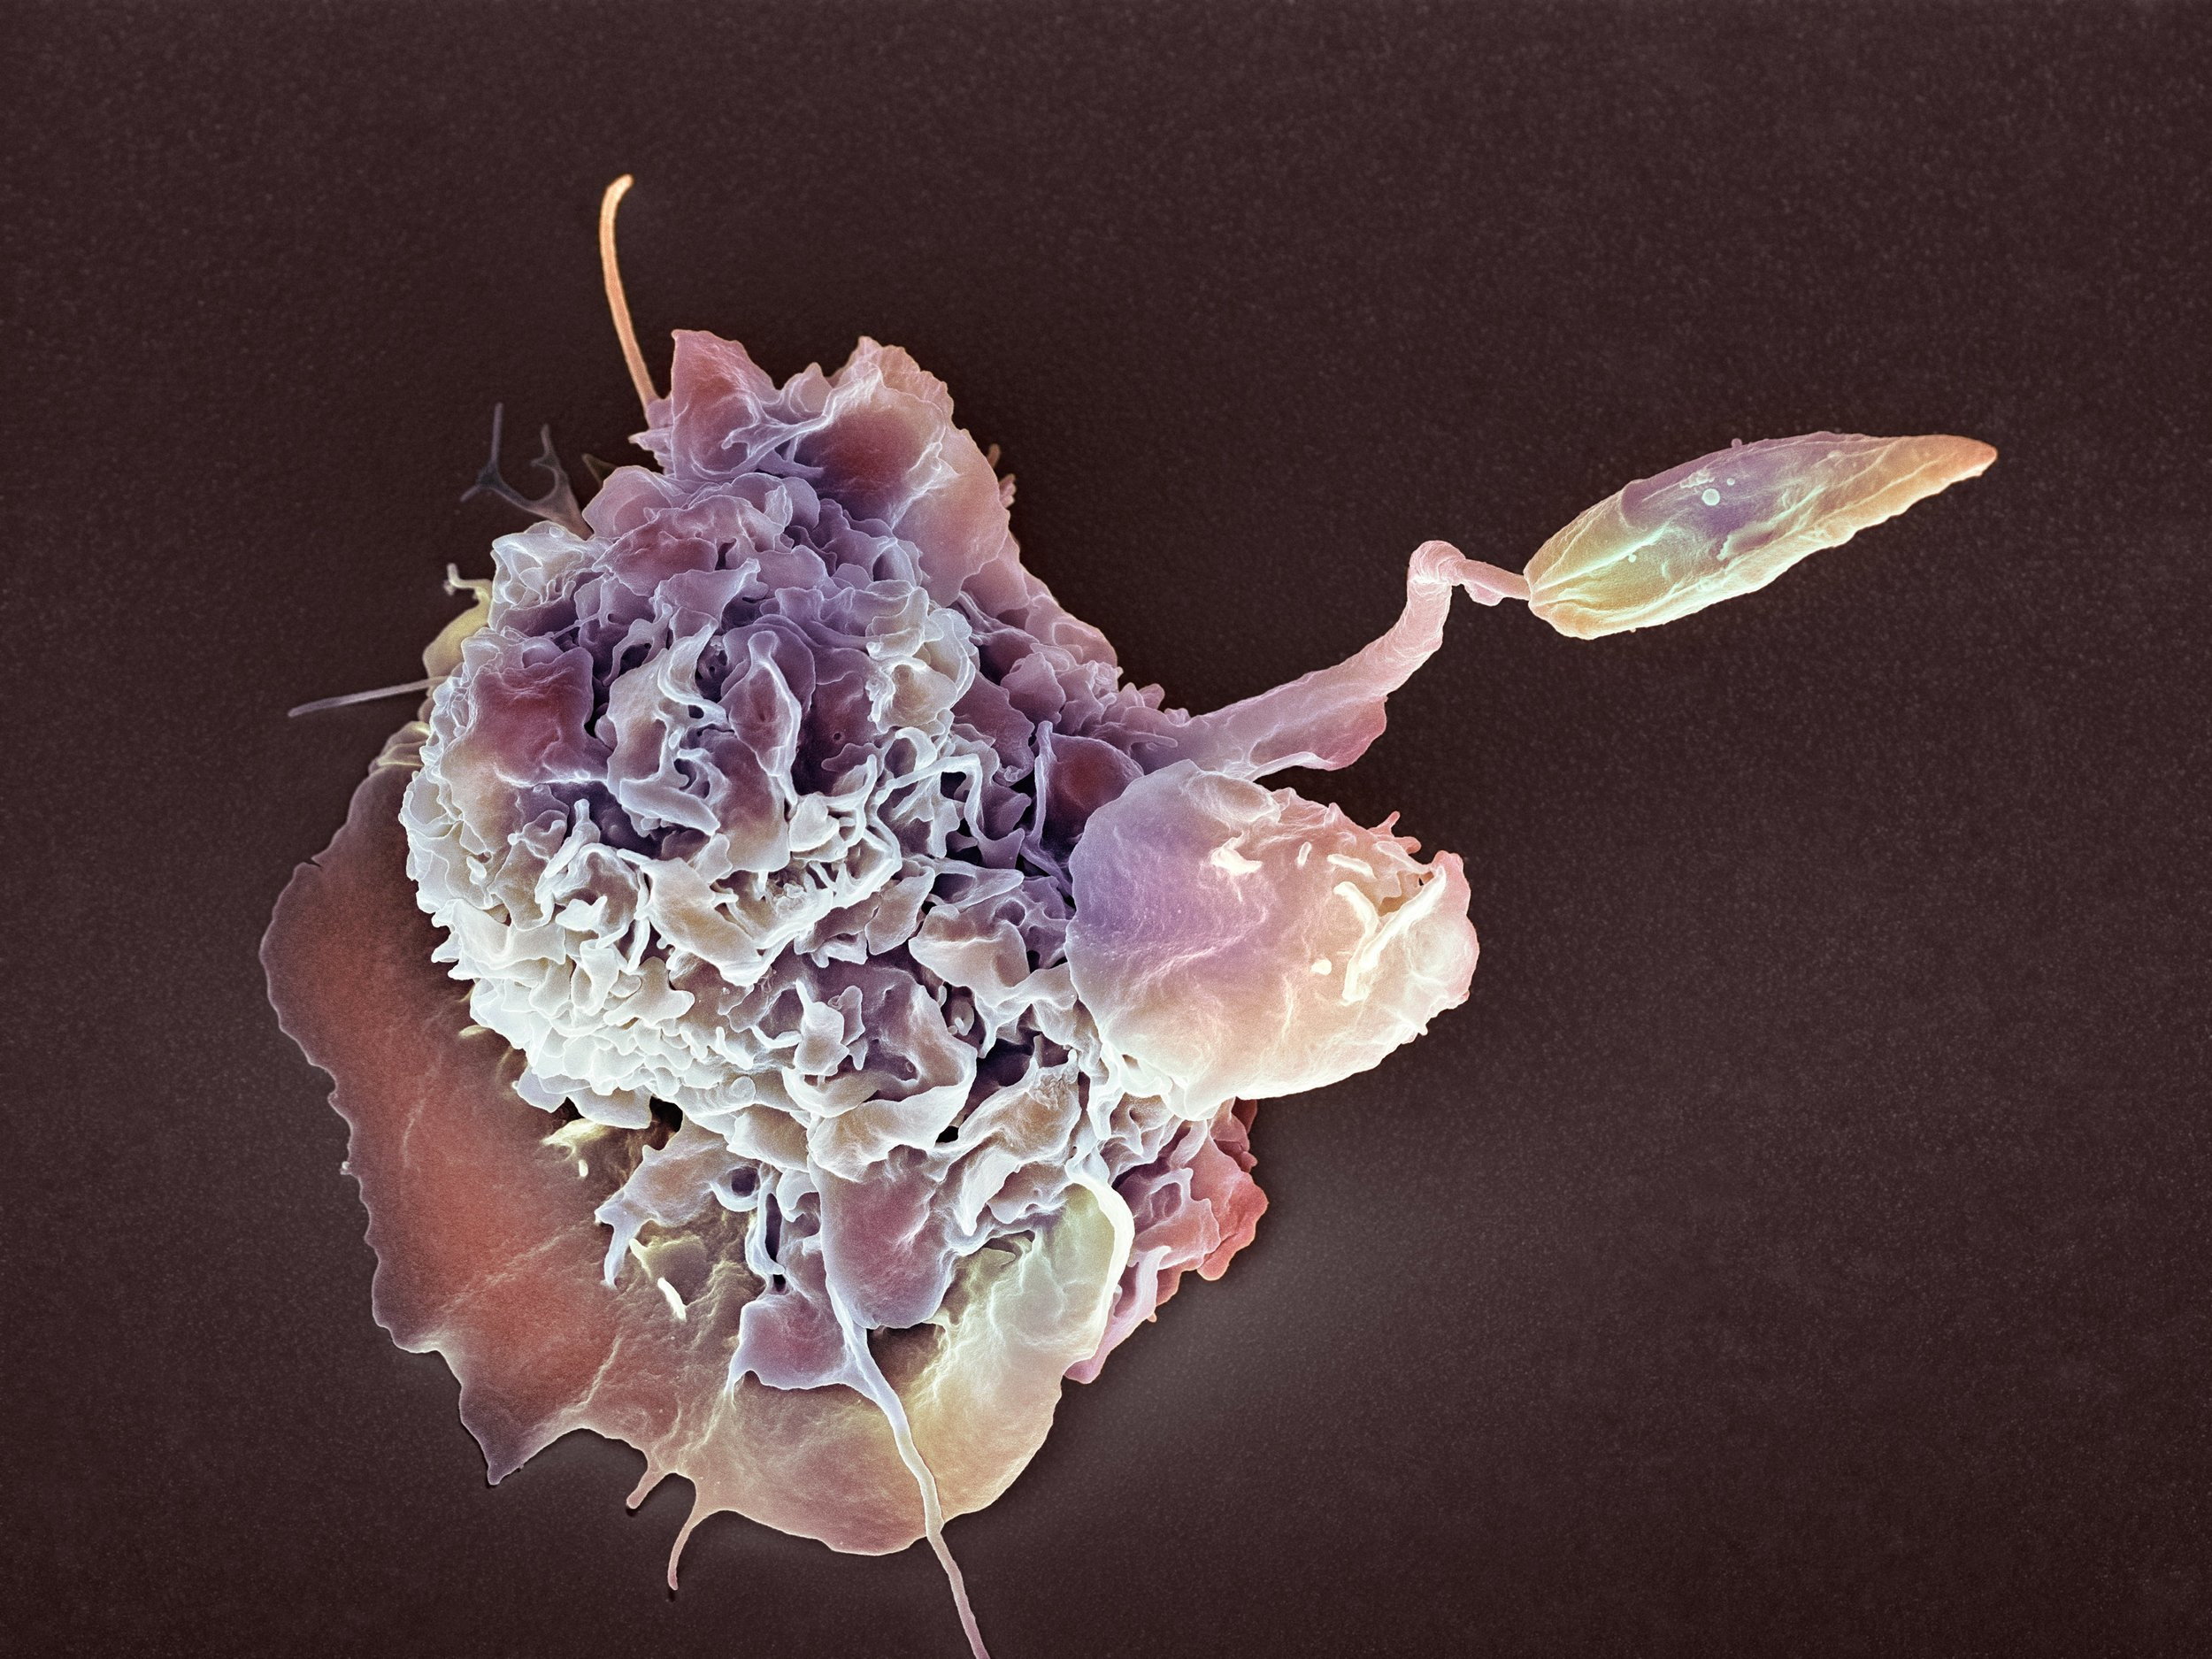 White blood cell eating a Leishmania parasite